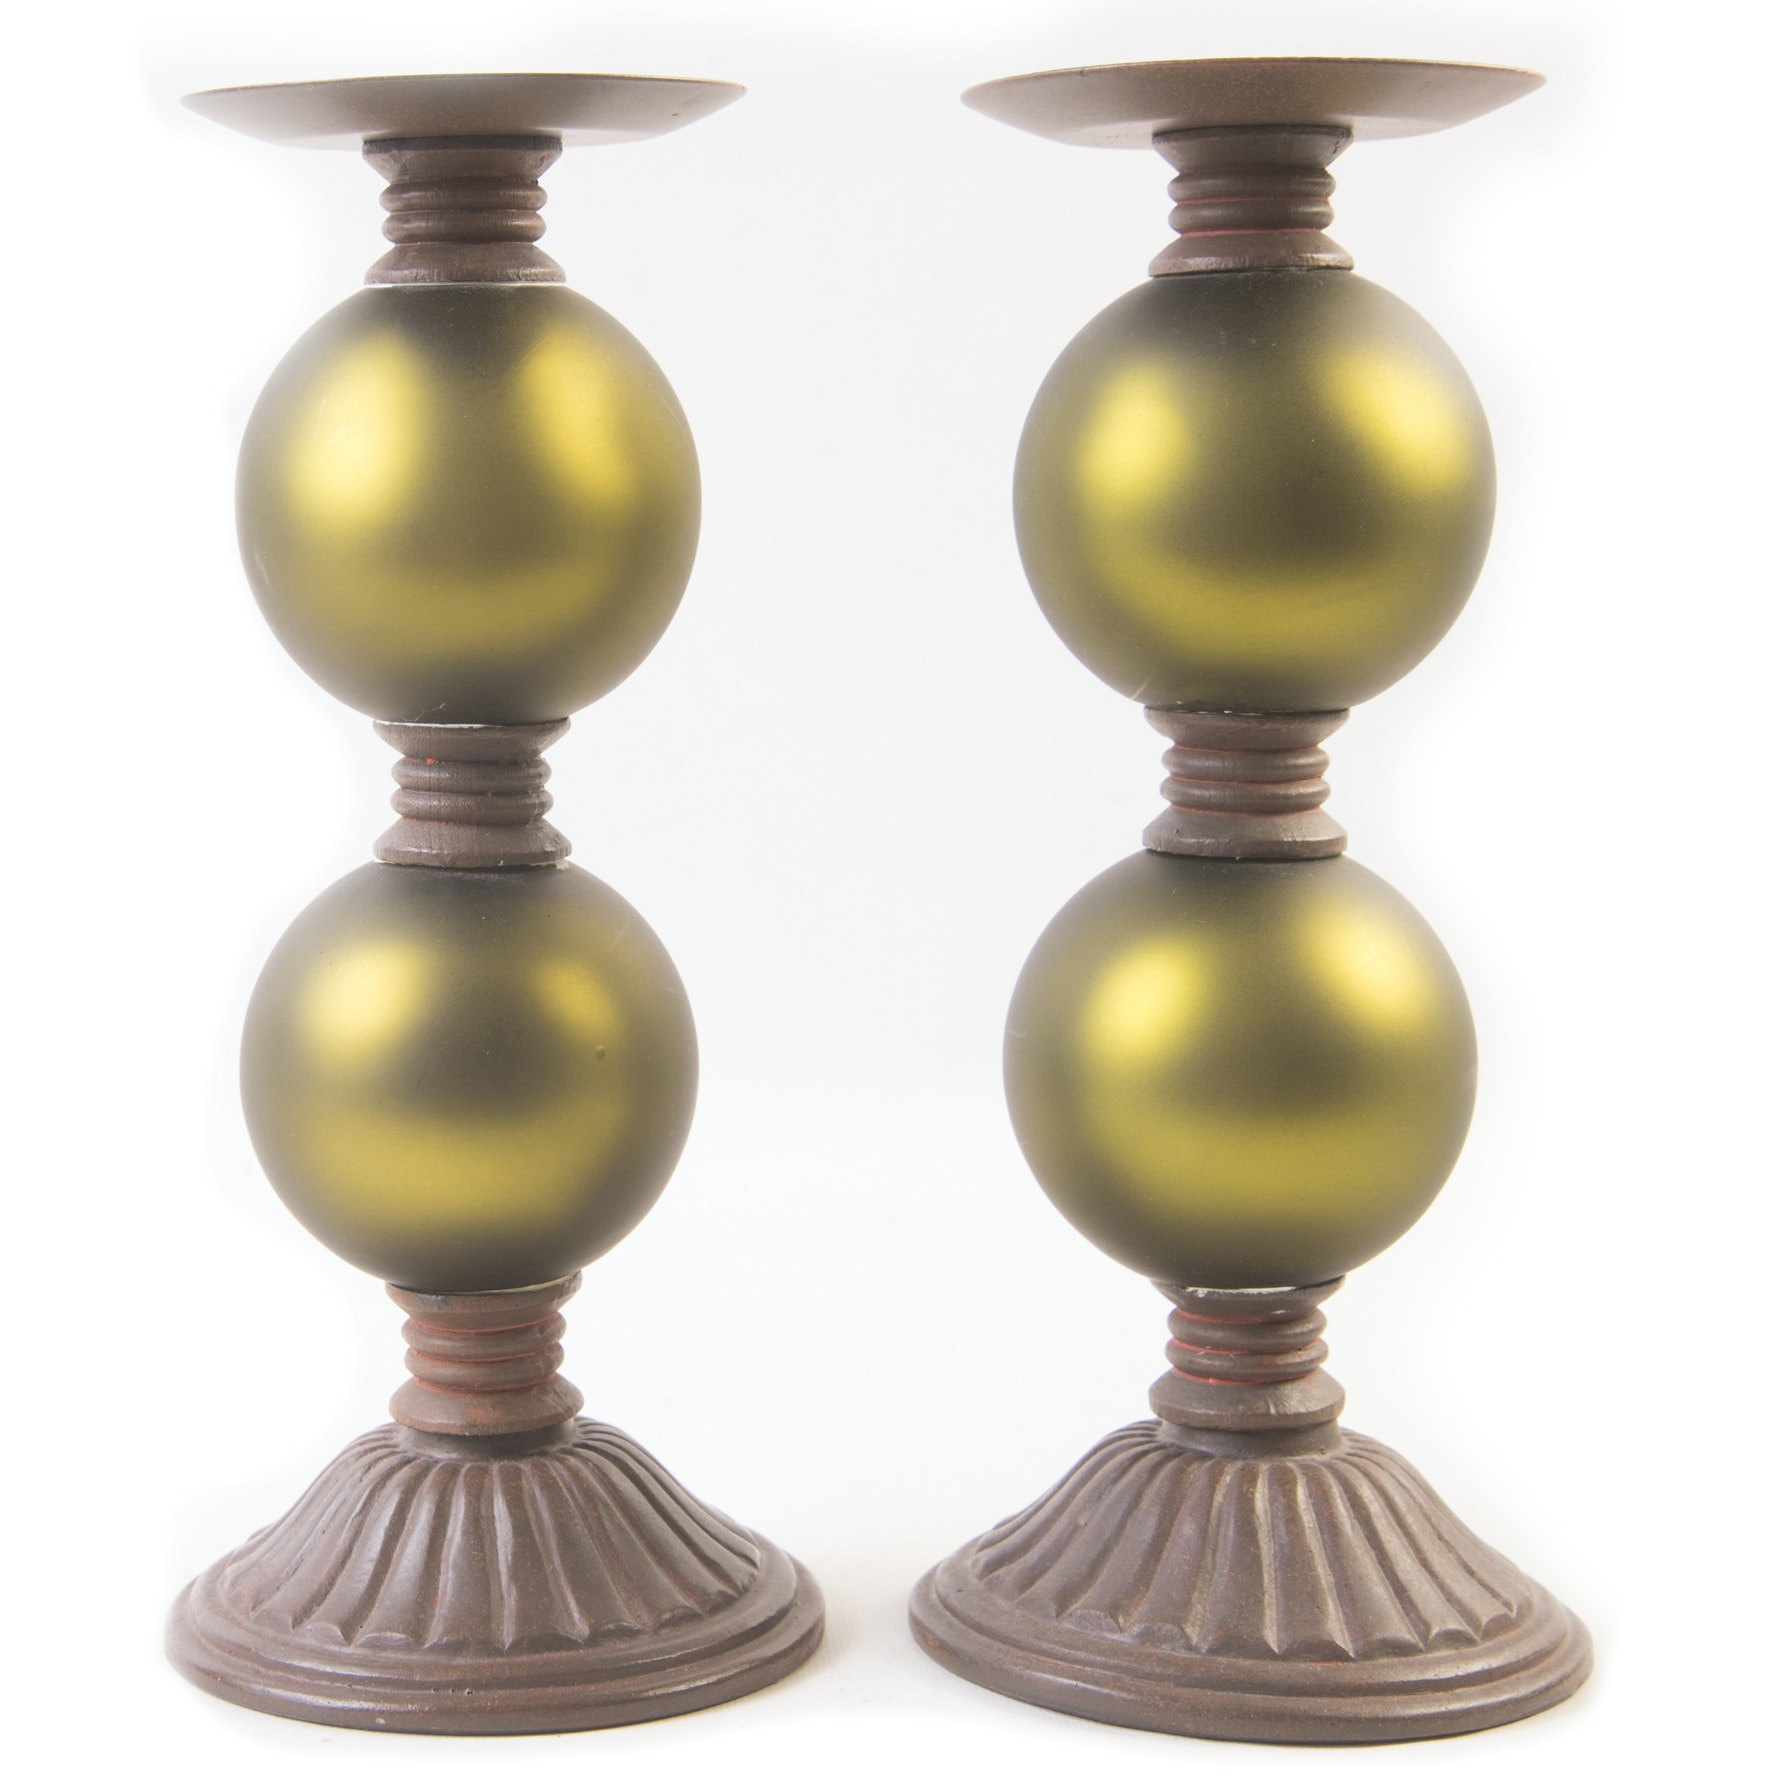 Decorative Pillar Candleholders